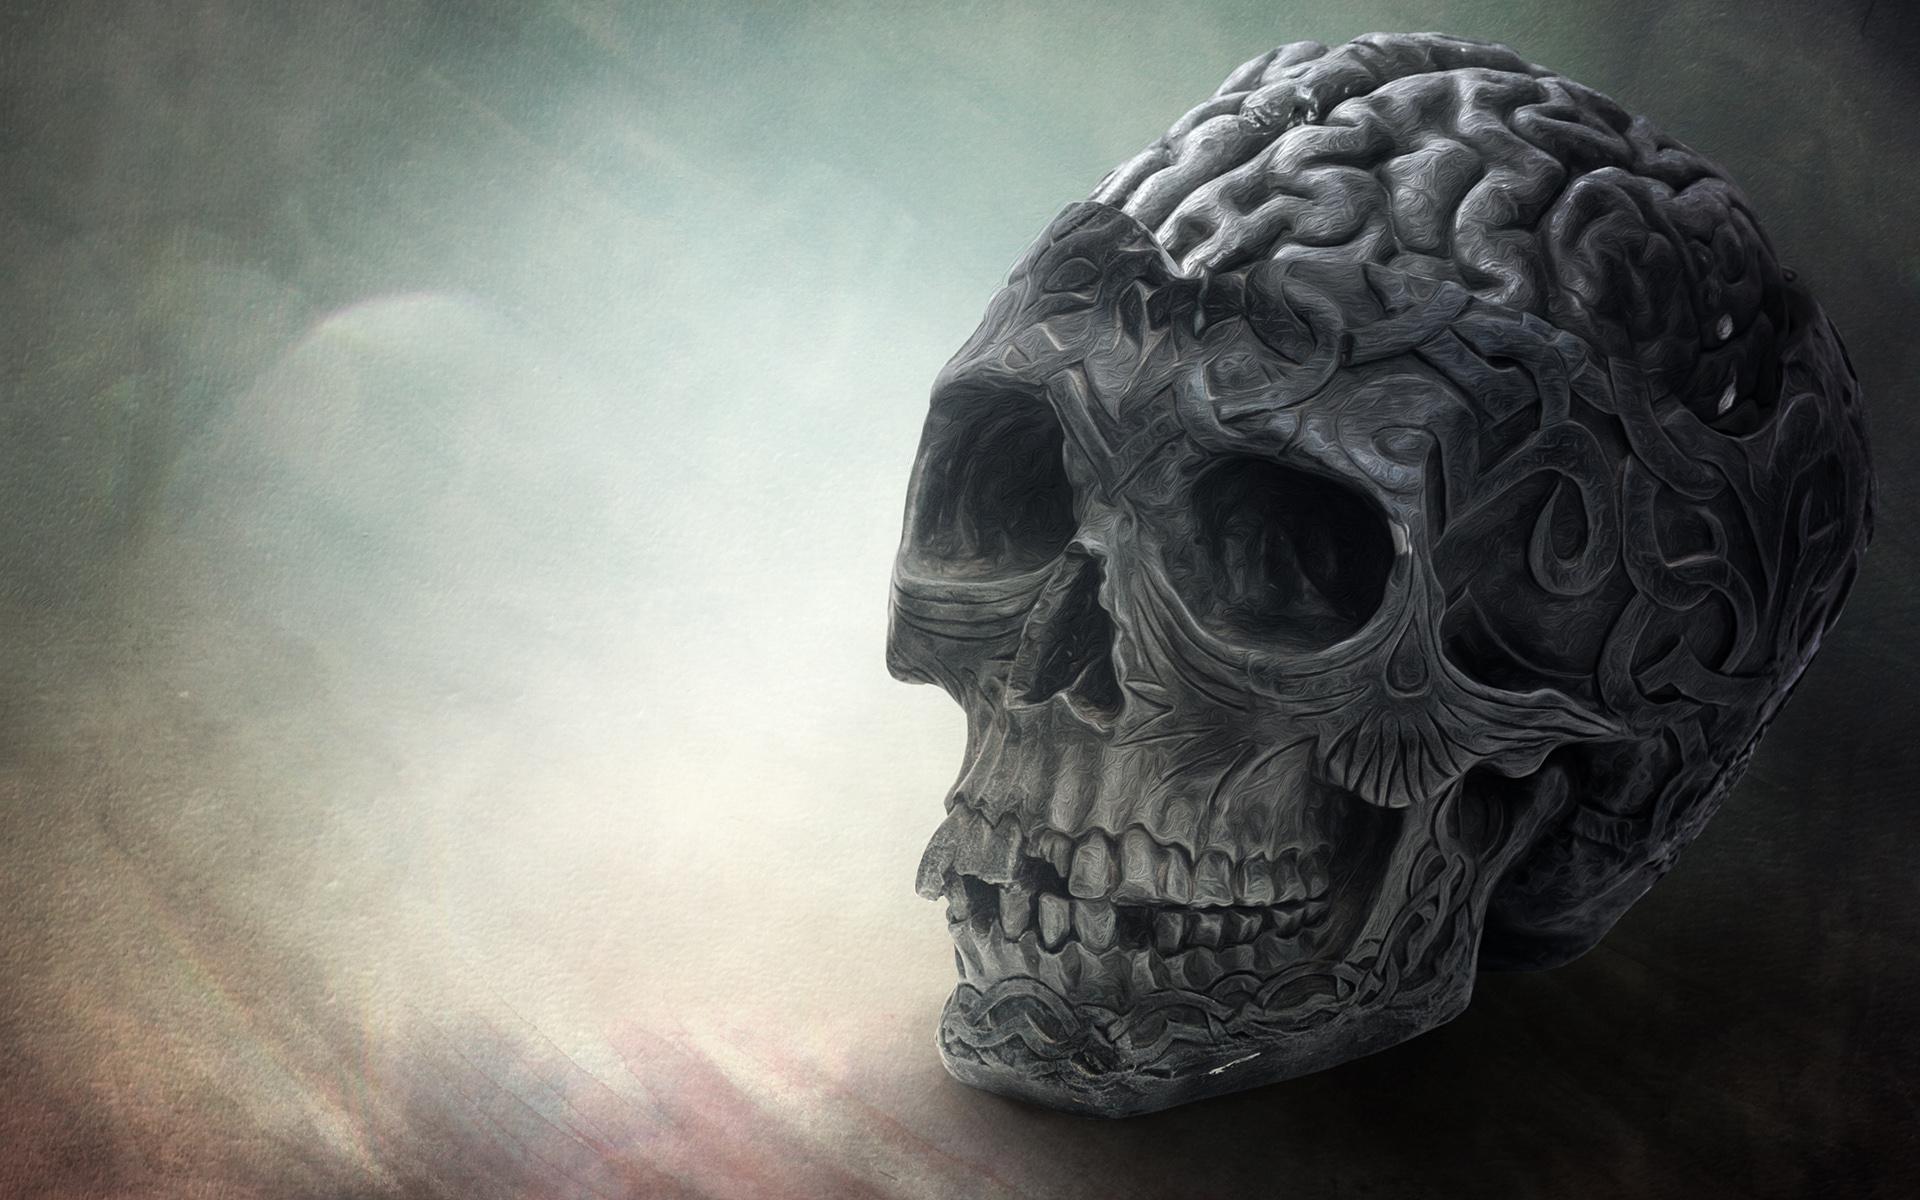 Brain Skull Wallpapers HD Wallpapers 1920x1200